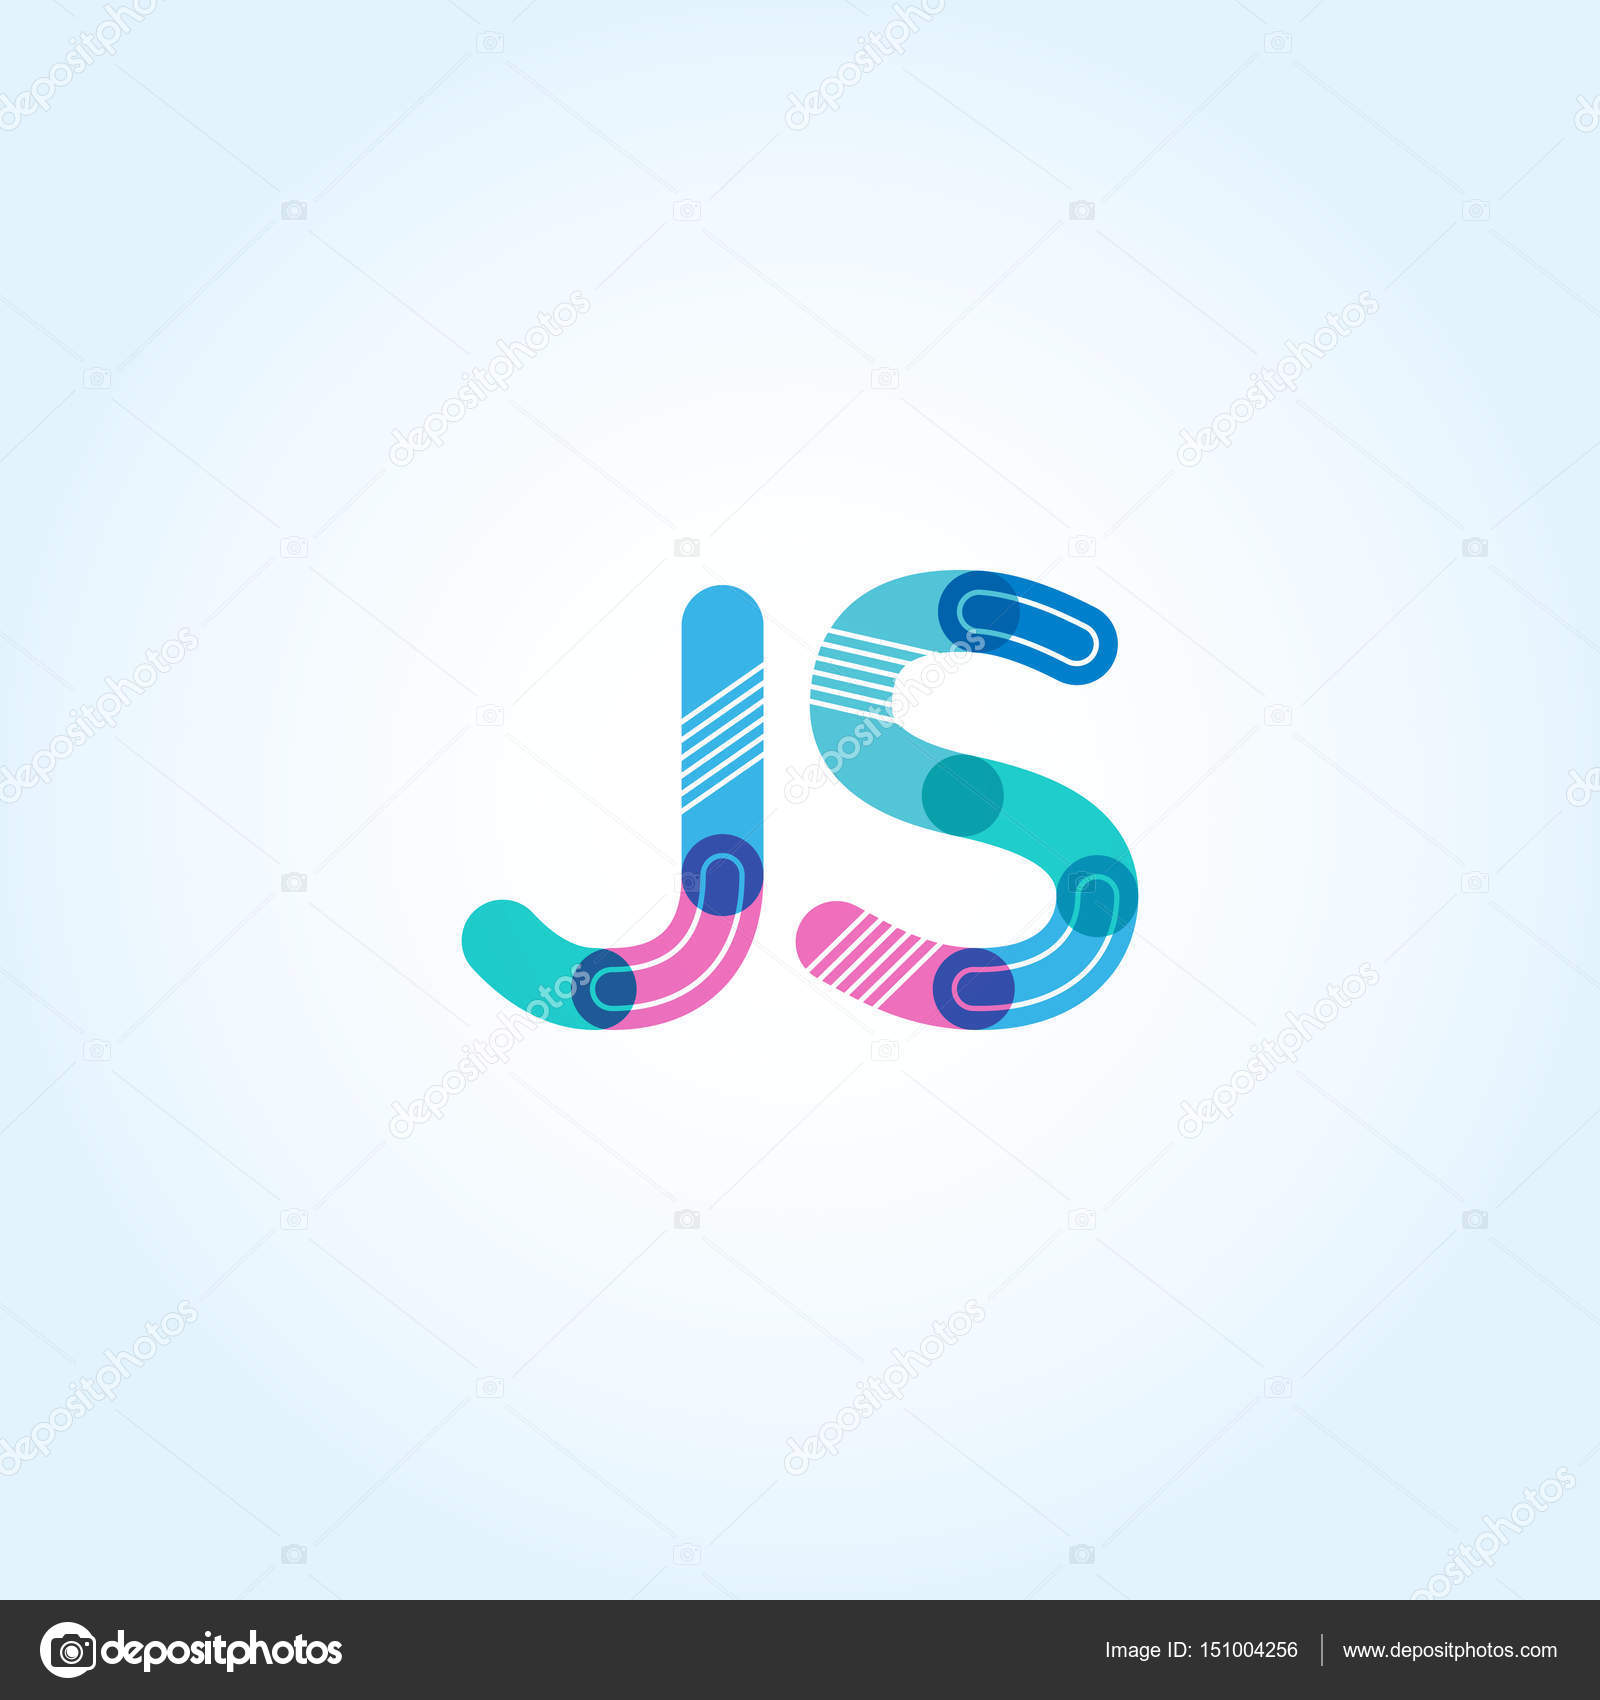 Lettering Js Last Word